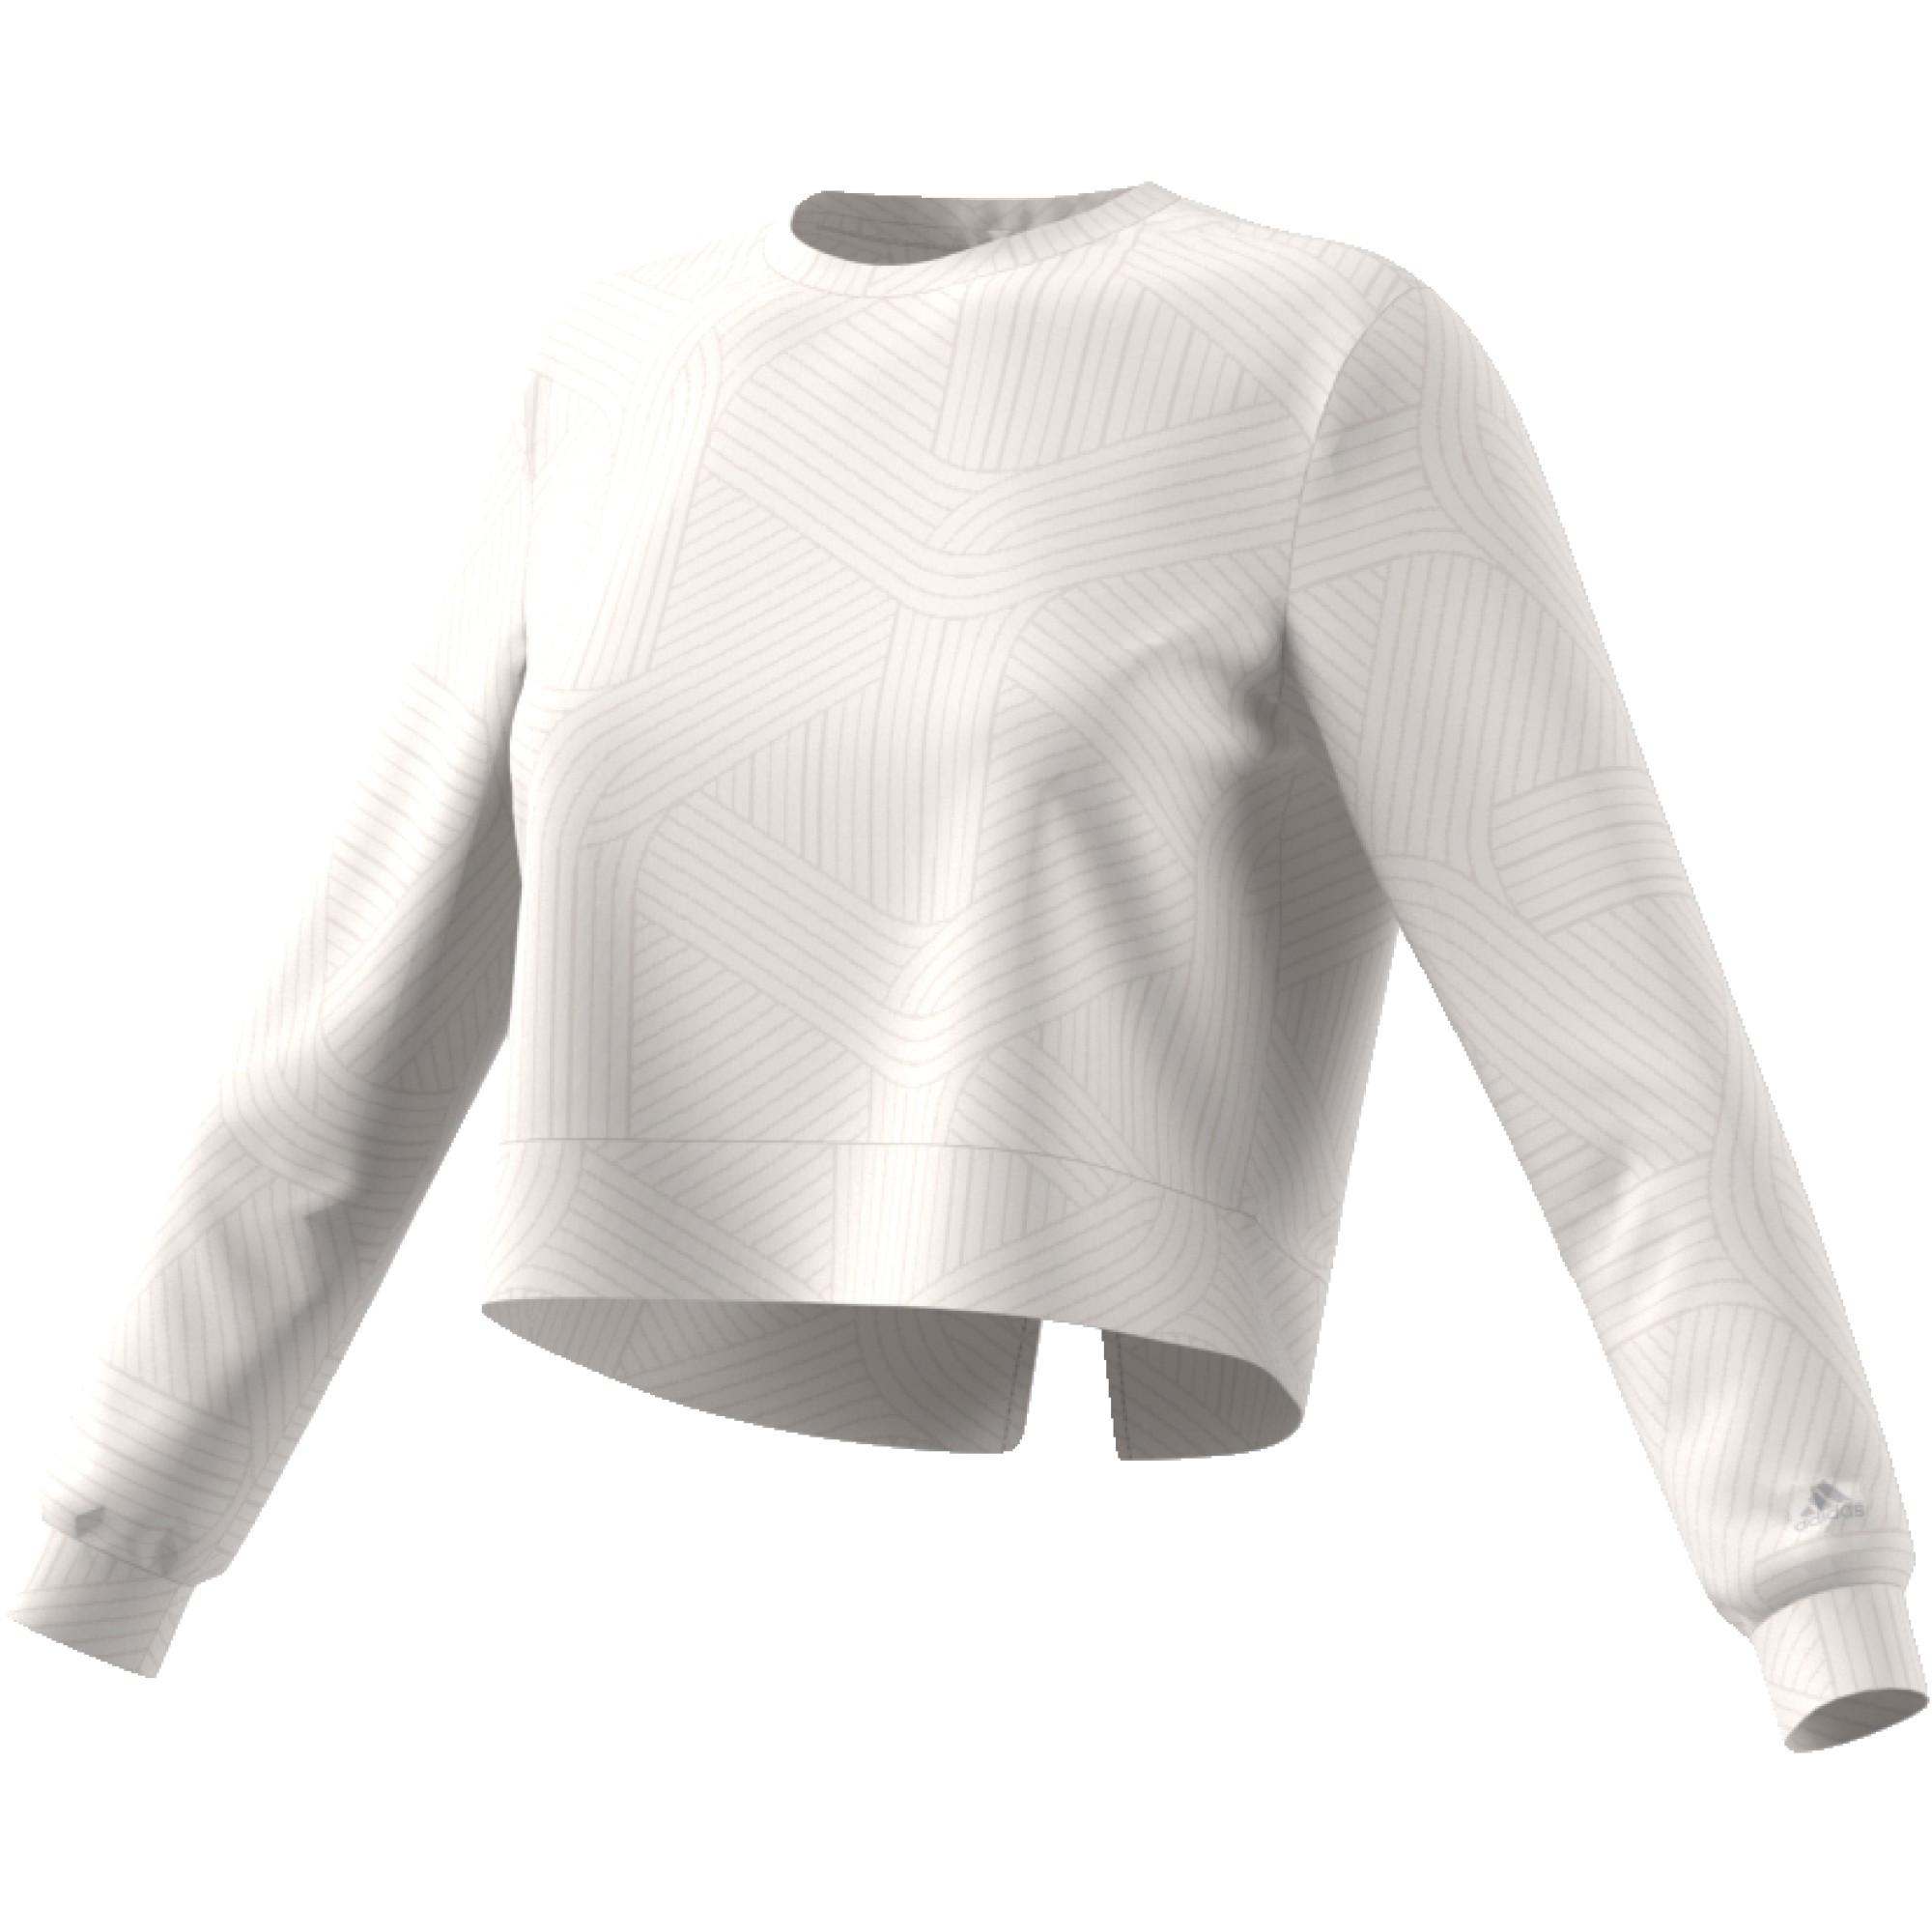 fdcacead502 Adidas Black And White Sweatshirt Womens